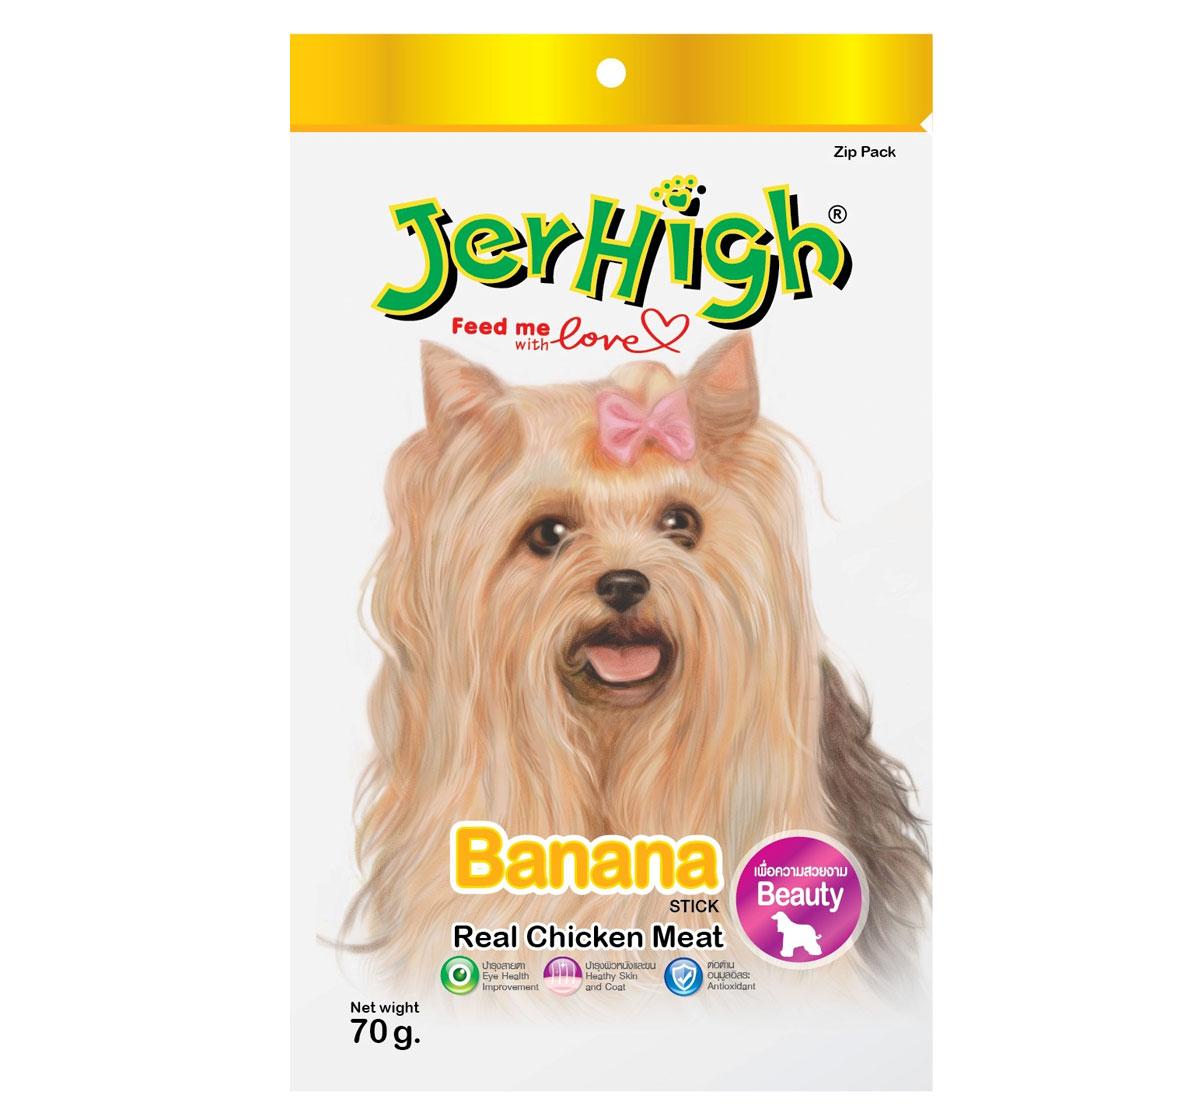 jerhigh fruity banana stick dog treats 70 gm dogspot online pet supply store. Black Bedroom Furniture Sets. Home Design Ideas